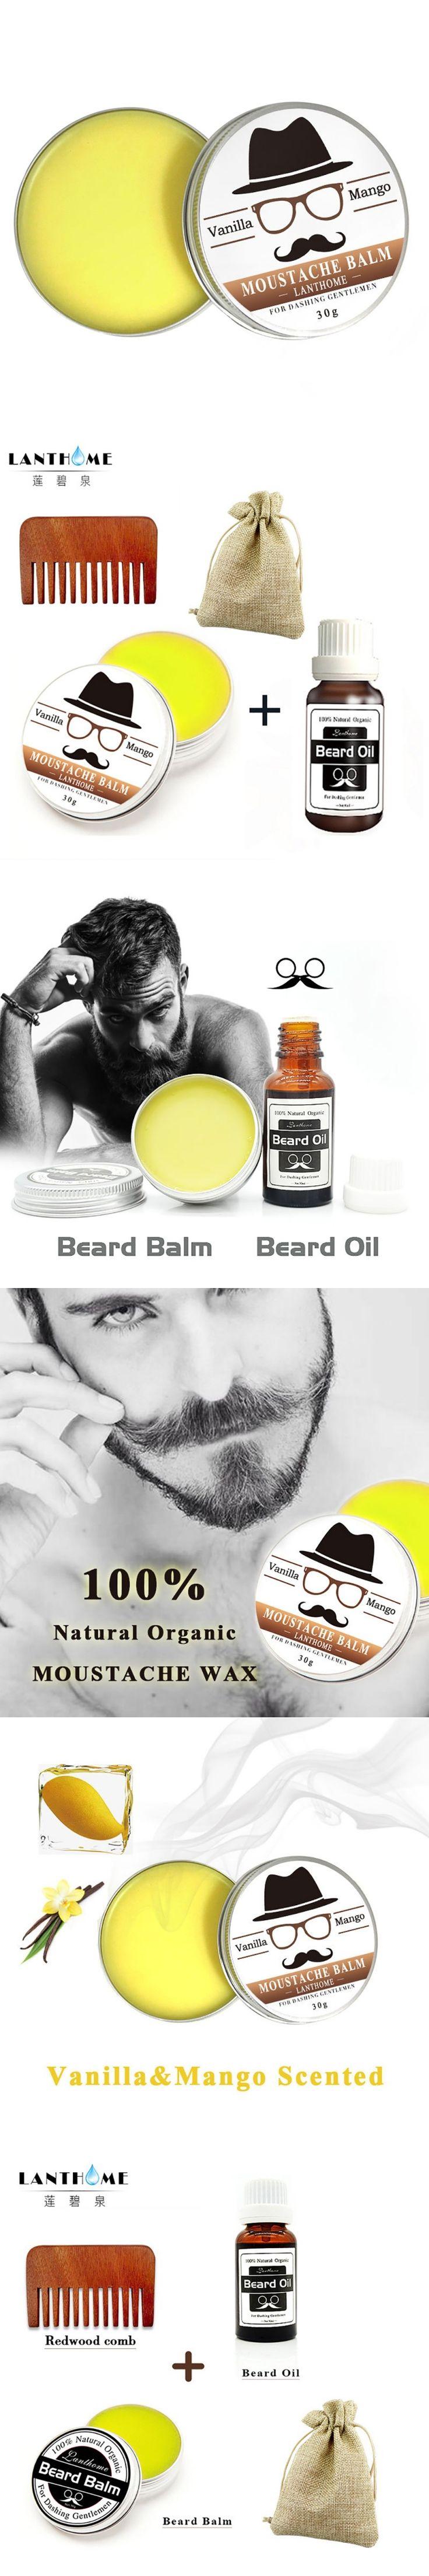 Natural Beard Wax Balm Beard Oil Men Shape Beard Grooming Beard products Healthy Conditioner Moisturizing Cream Makeup